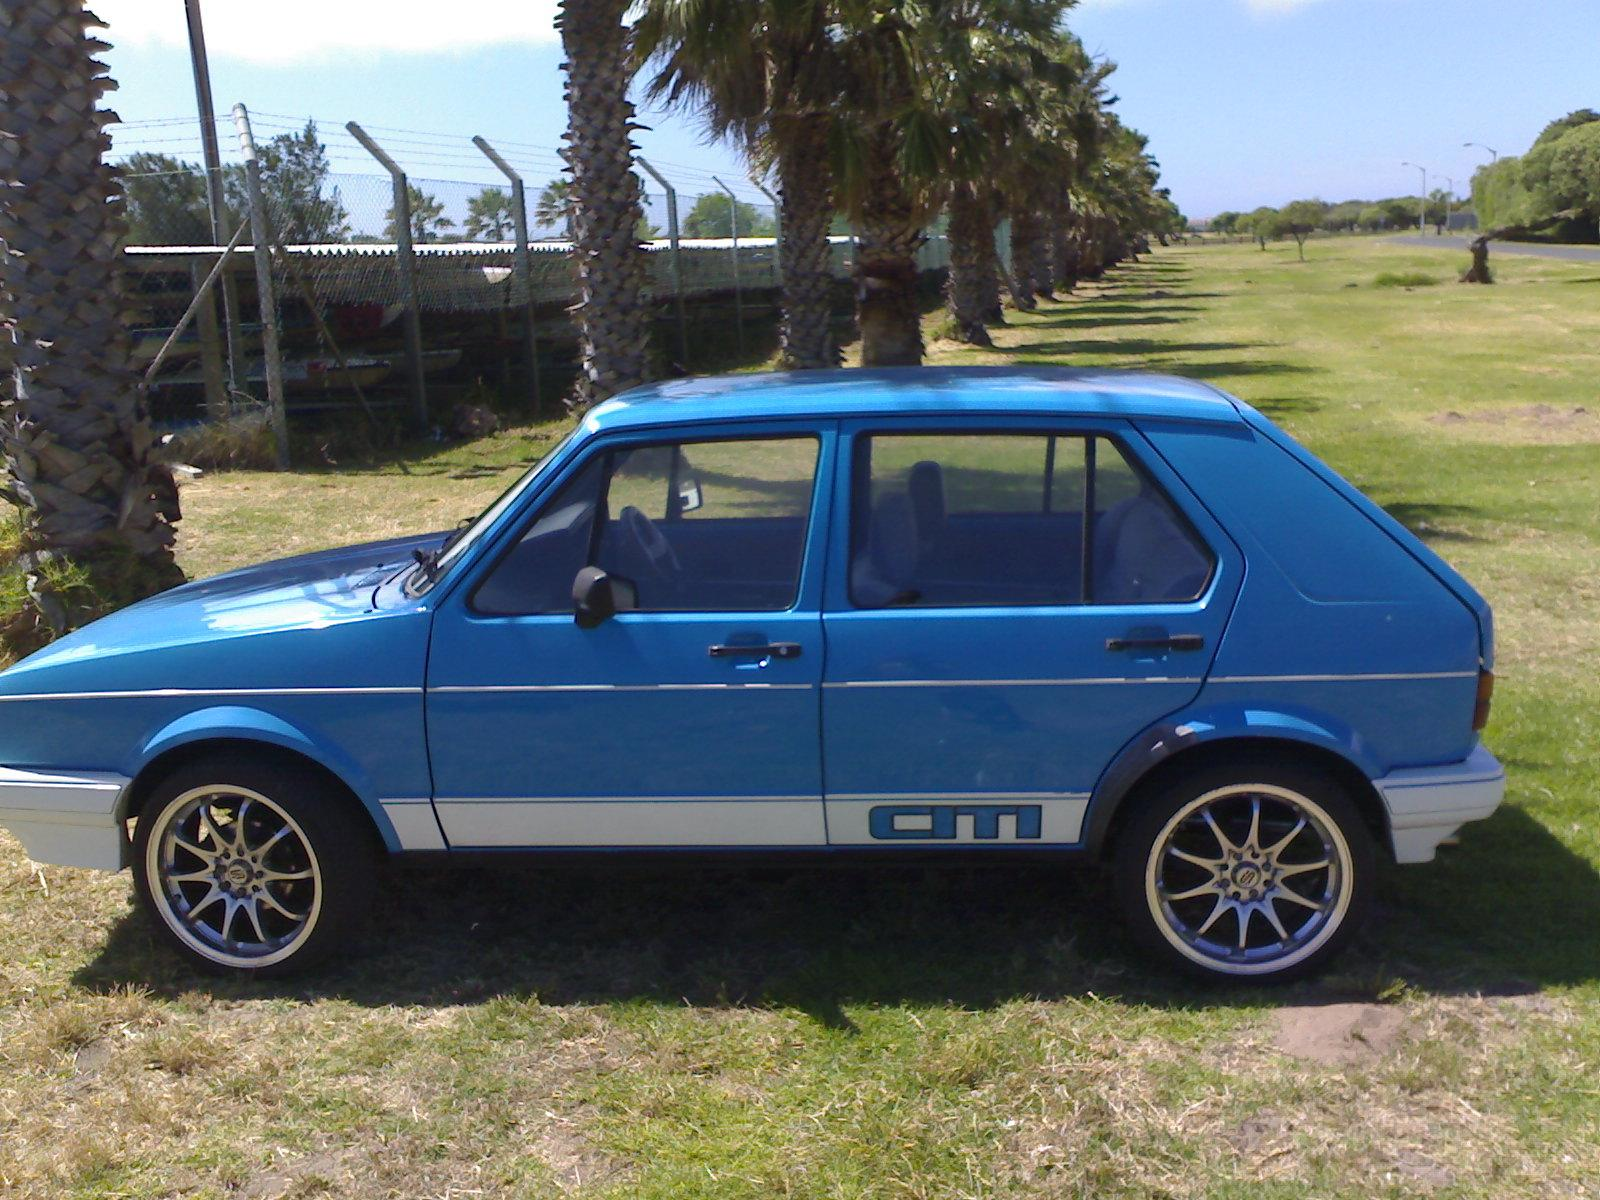 Vw citi golf 1. 3 manual/ red cars & bakkies 1057552399 | olx.